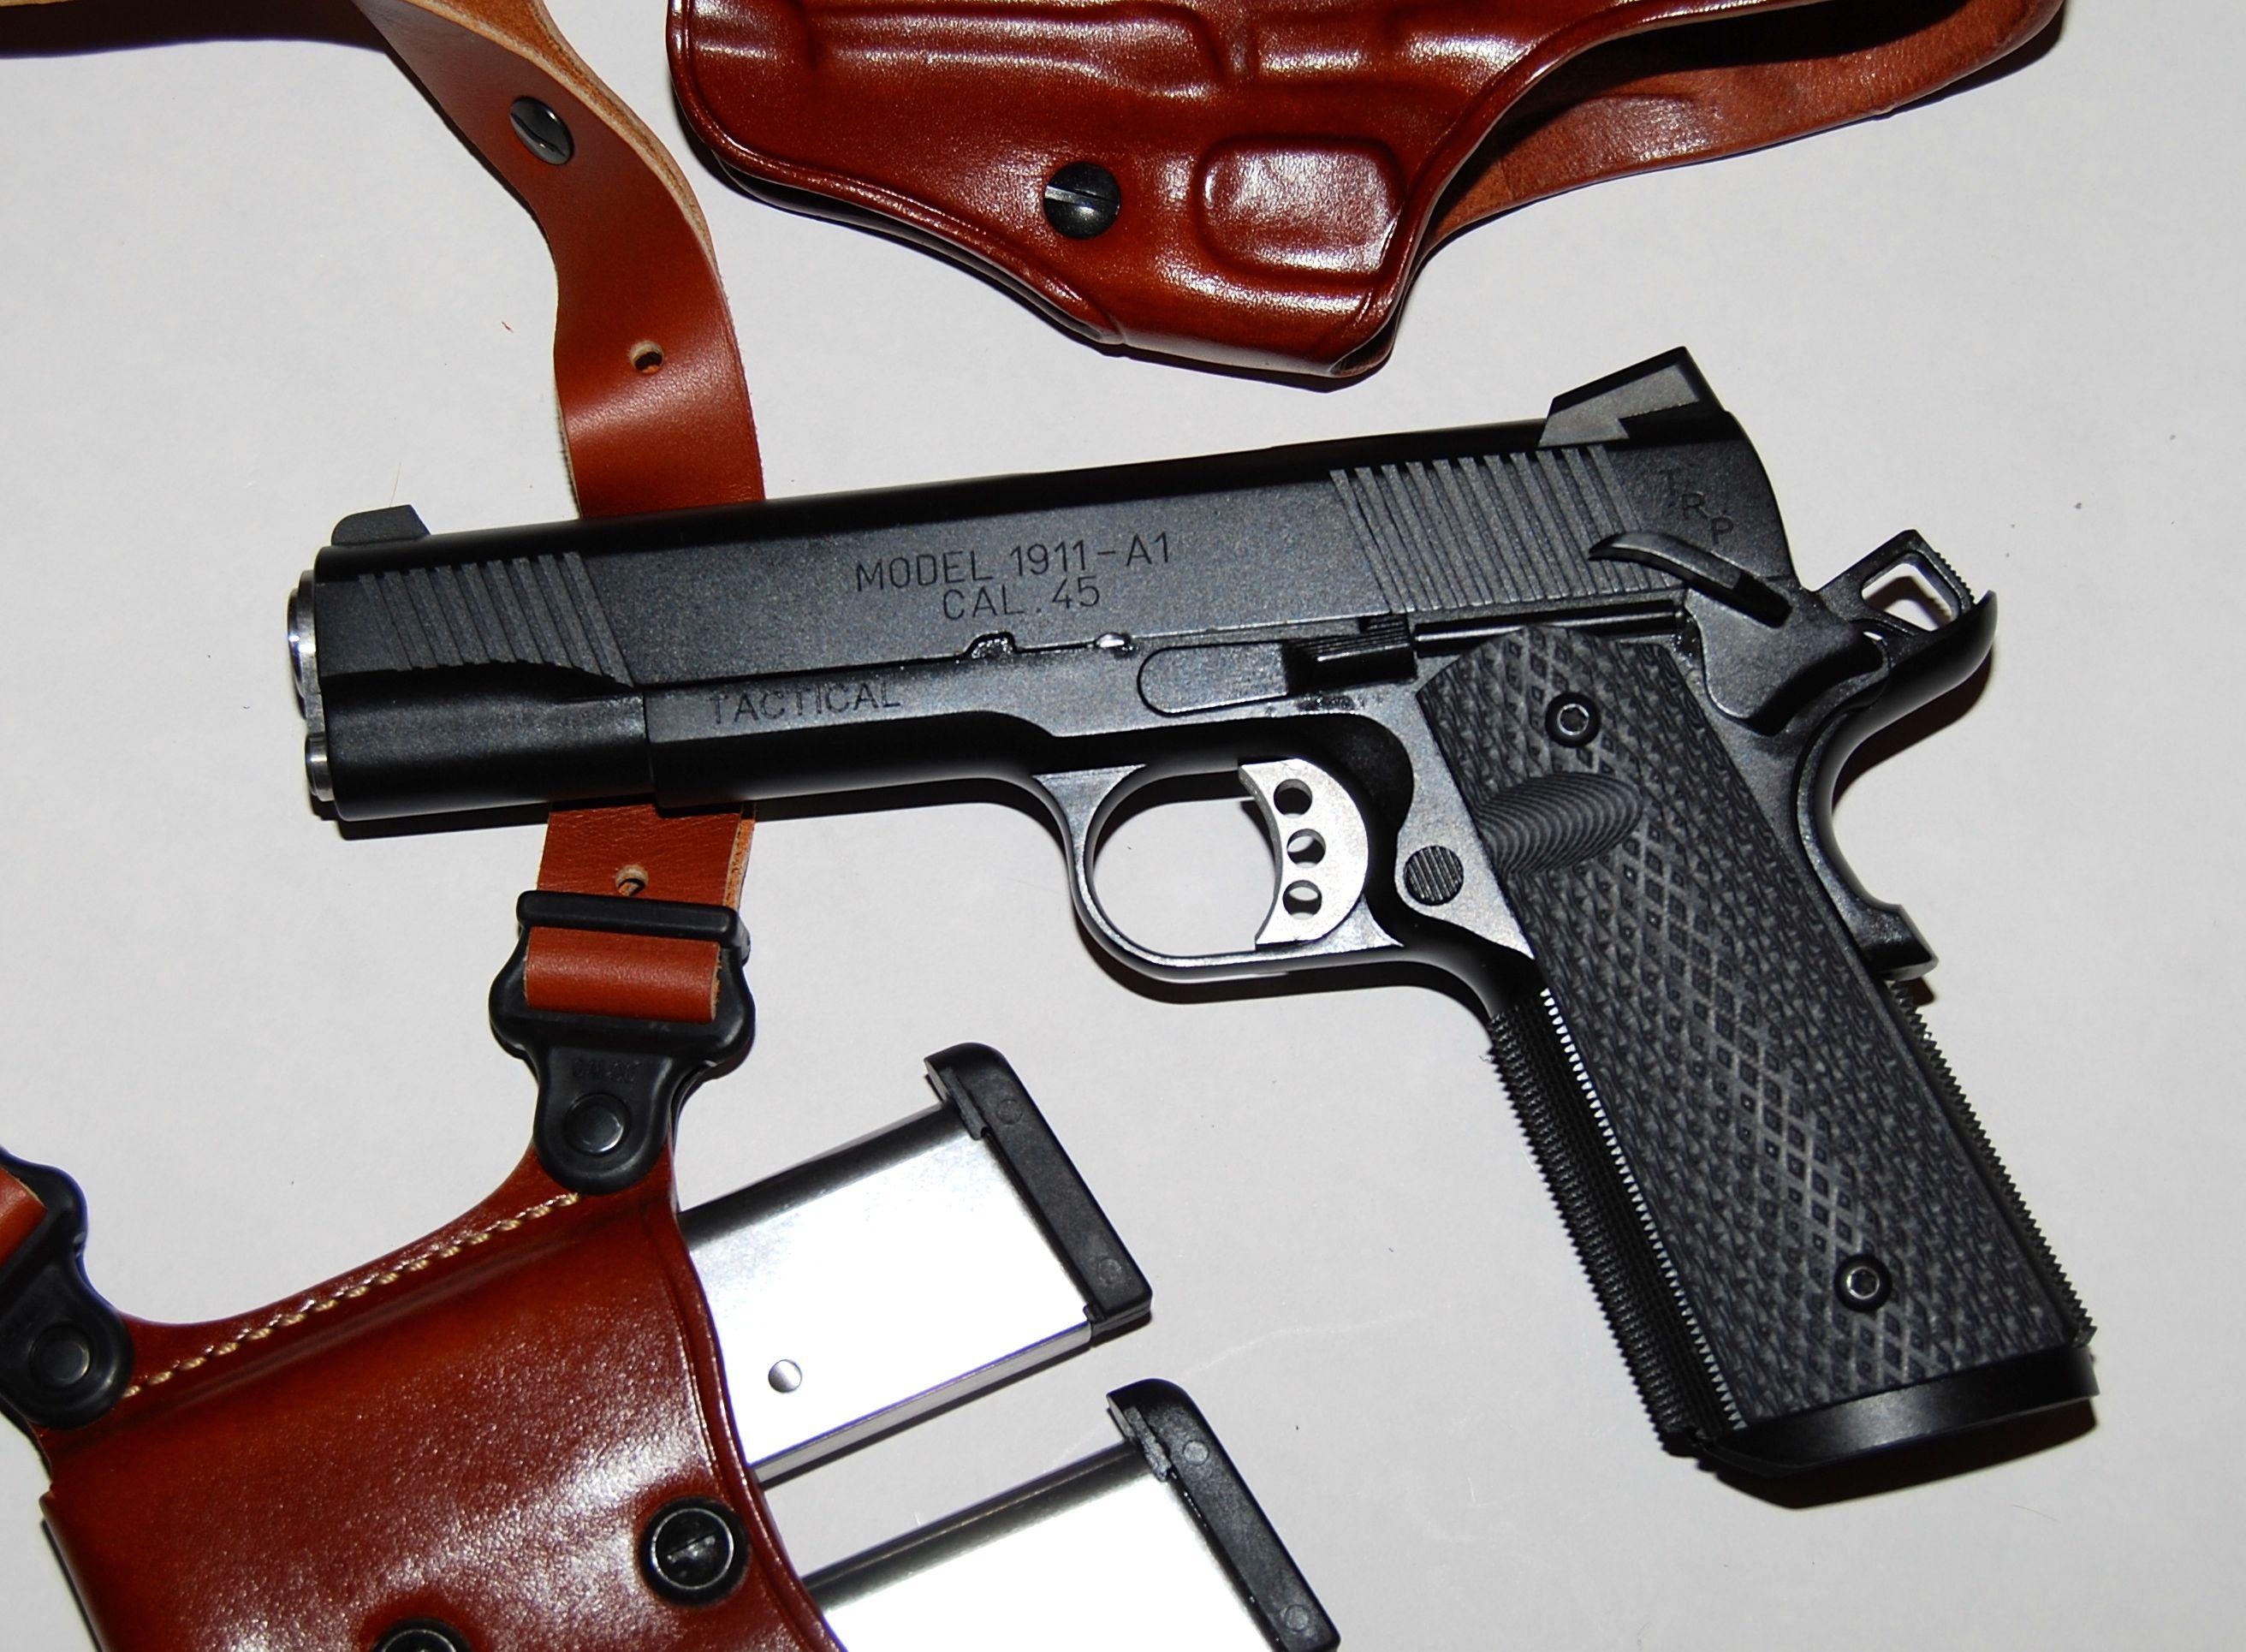 Springfield Professional 1911 .45 Fbi Gun | News Of New Car 2019 2020